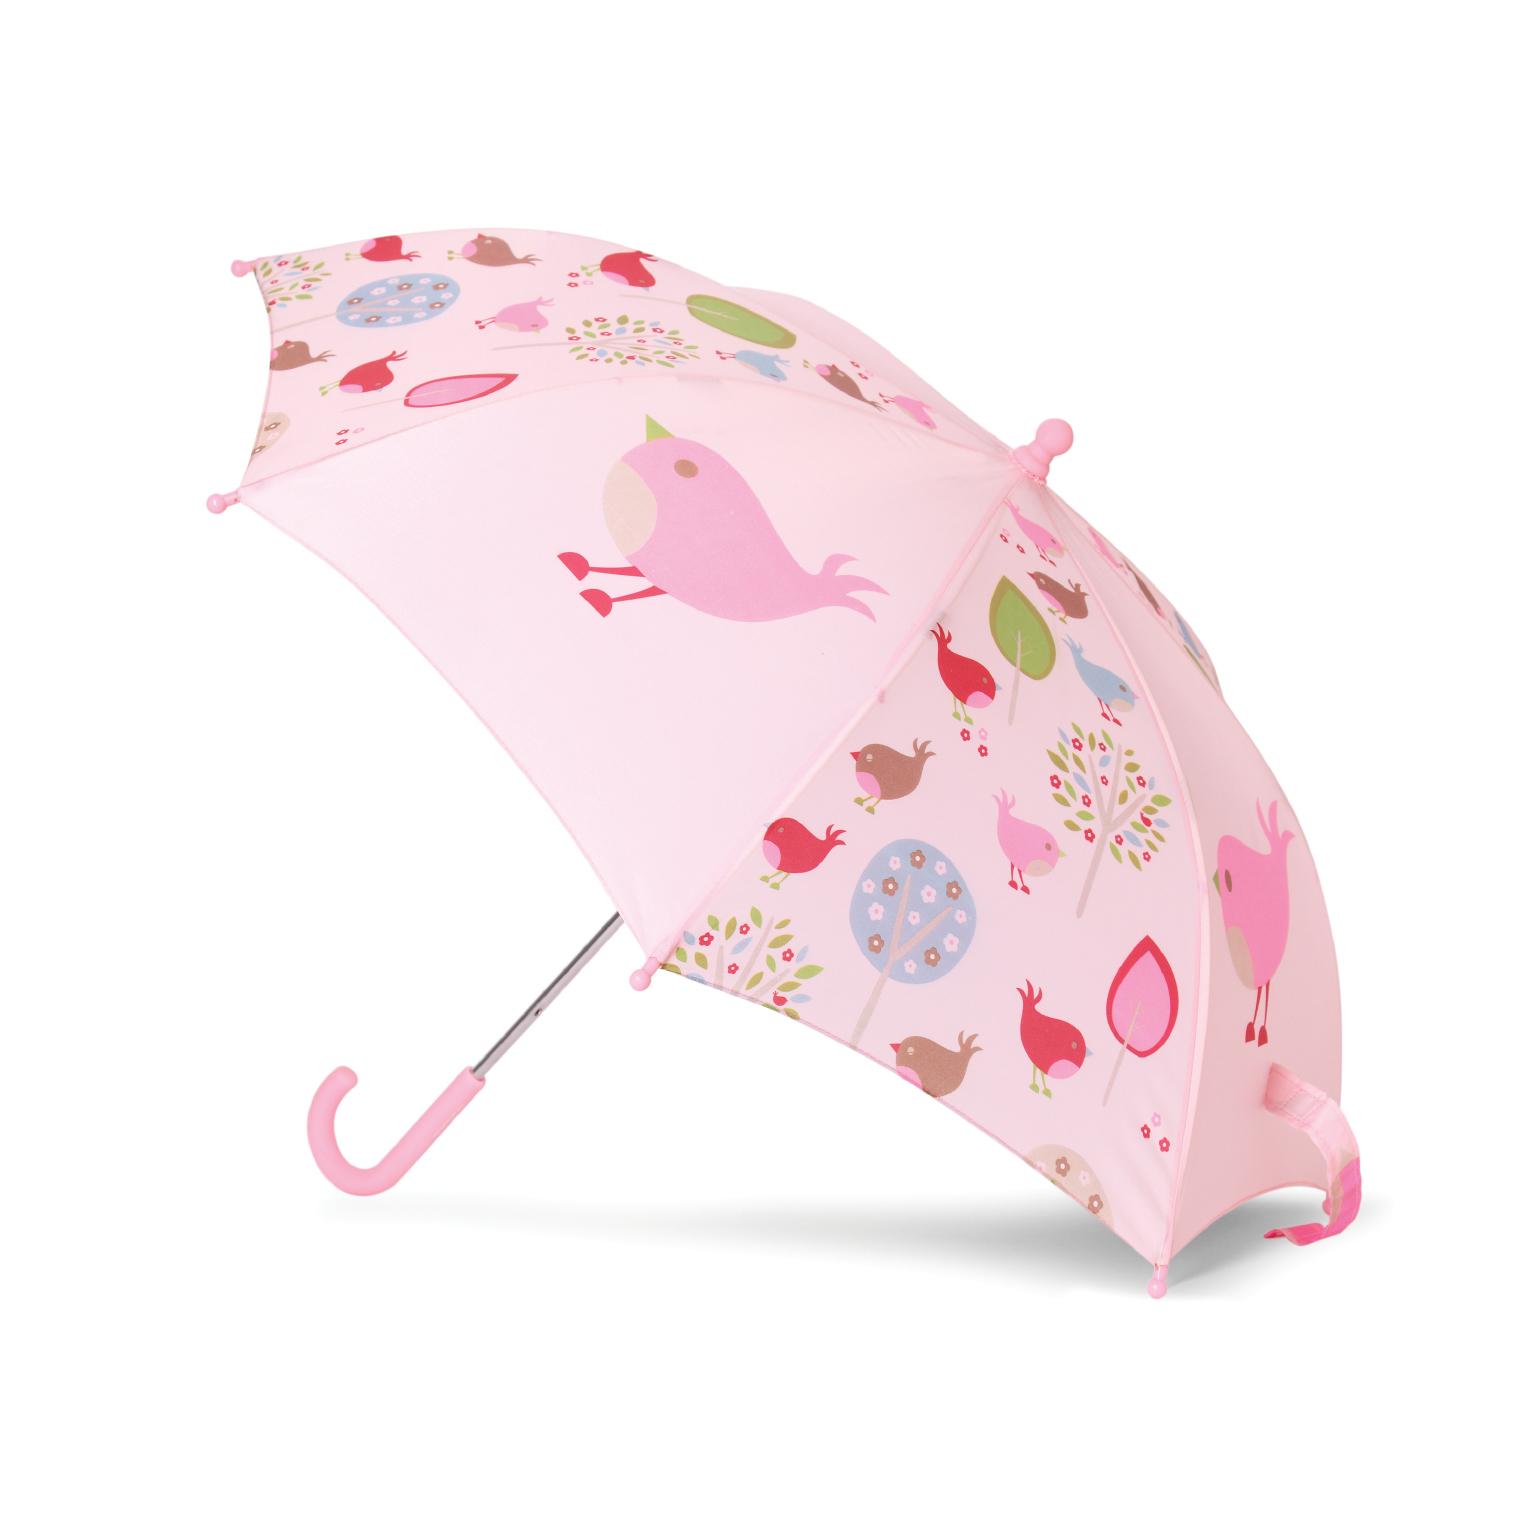 Chirpy Bird Umbrella image